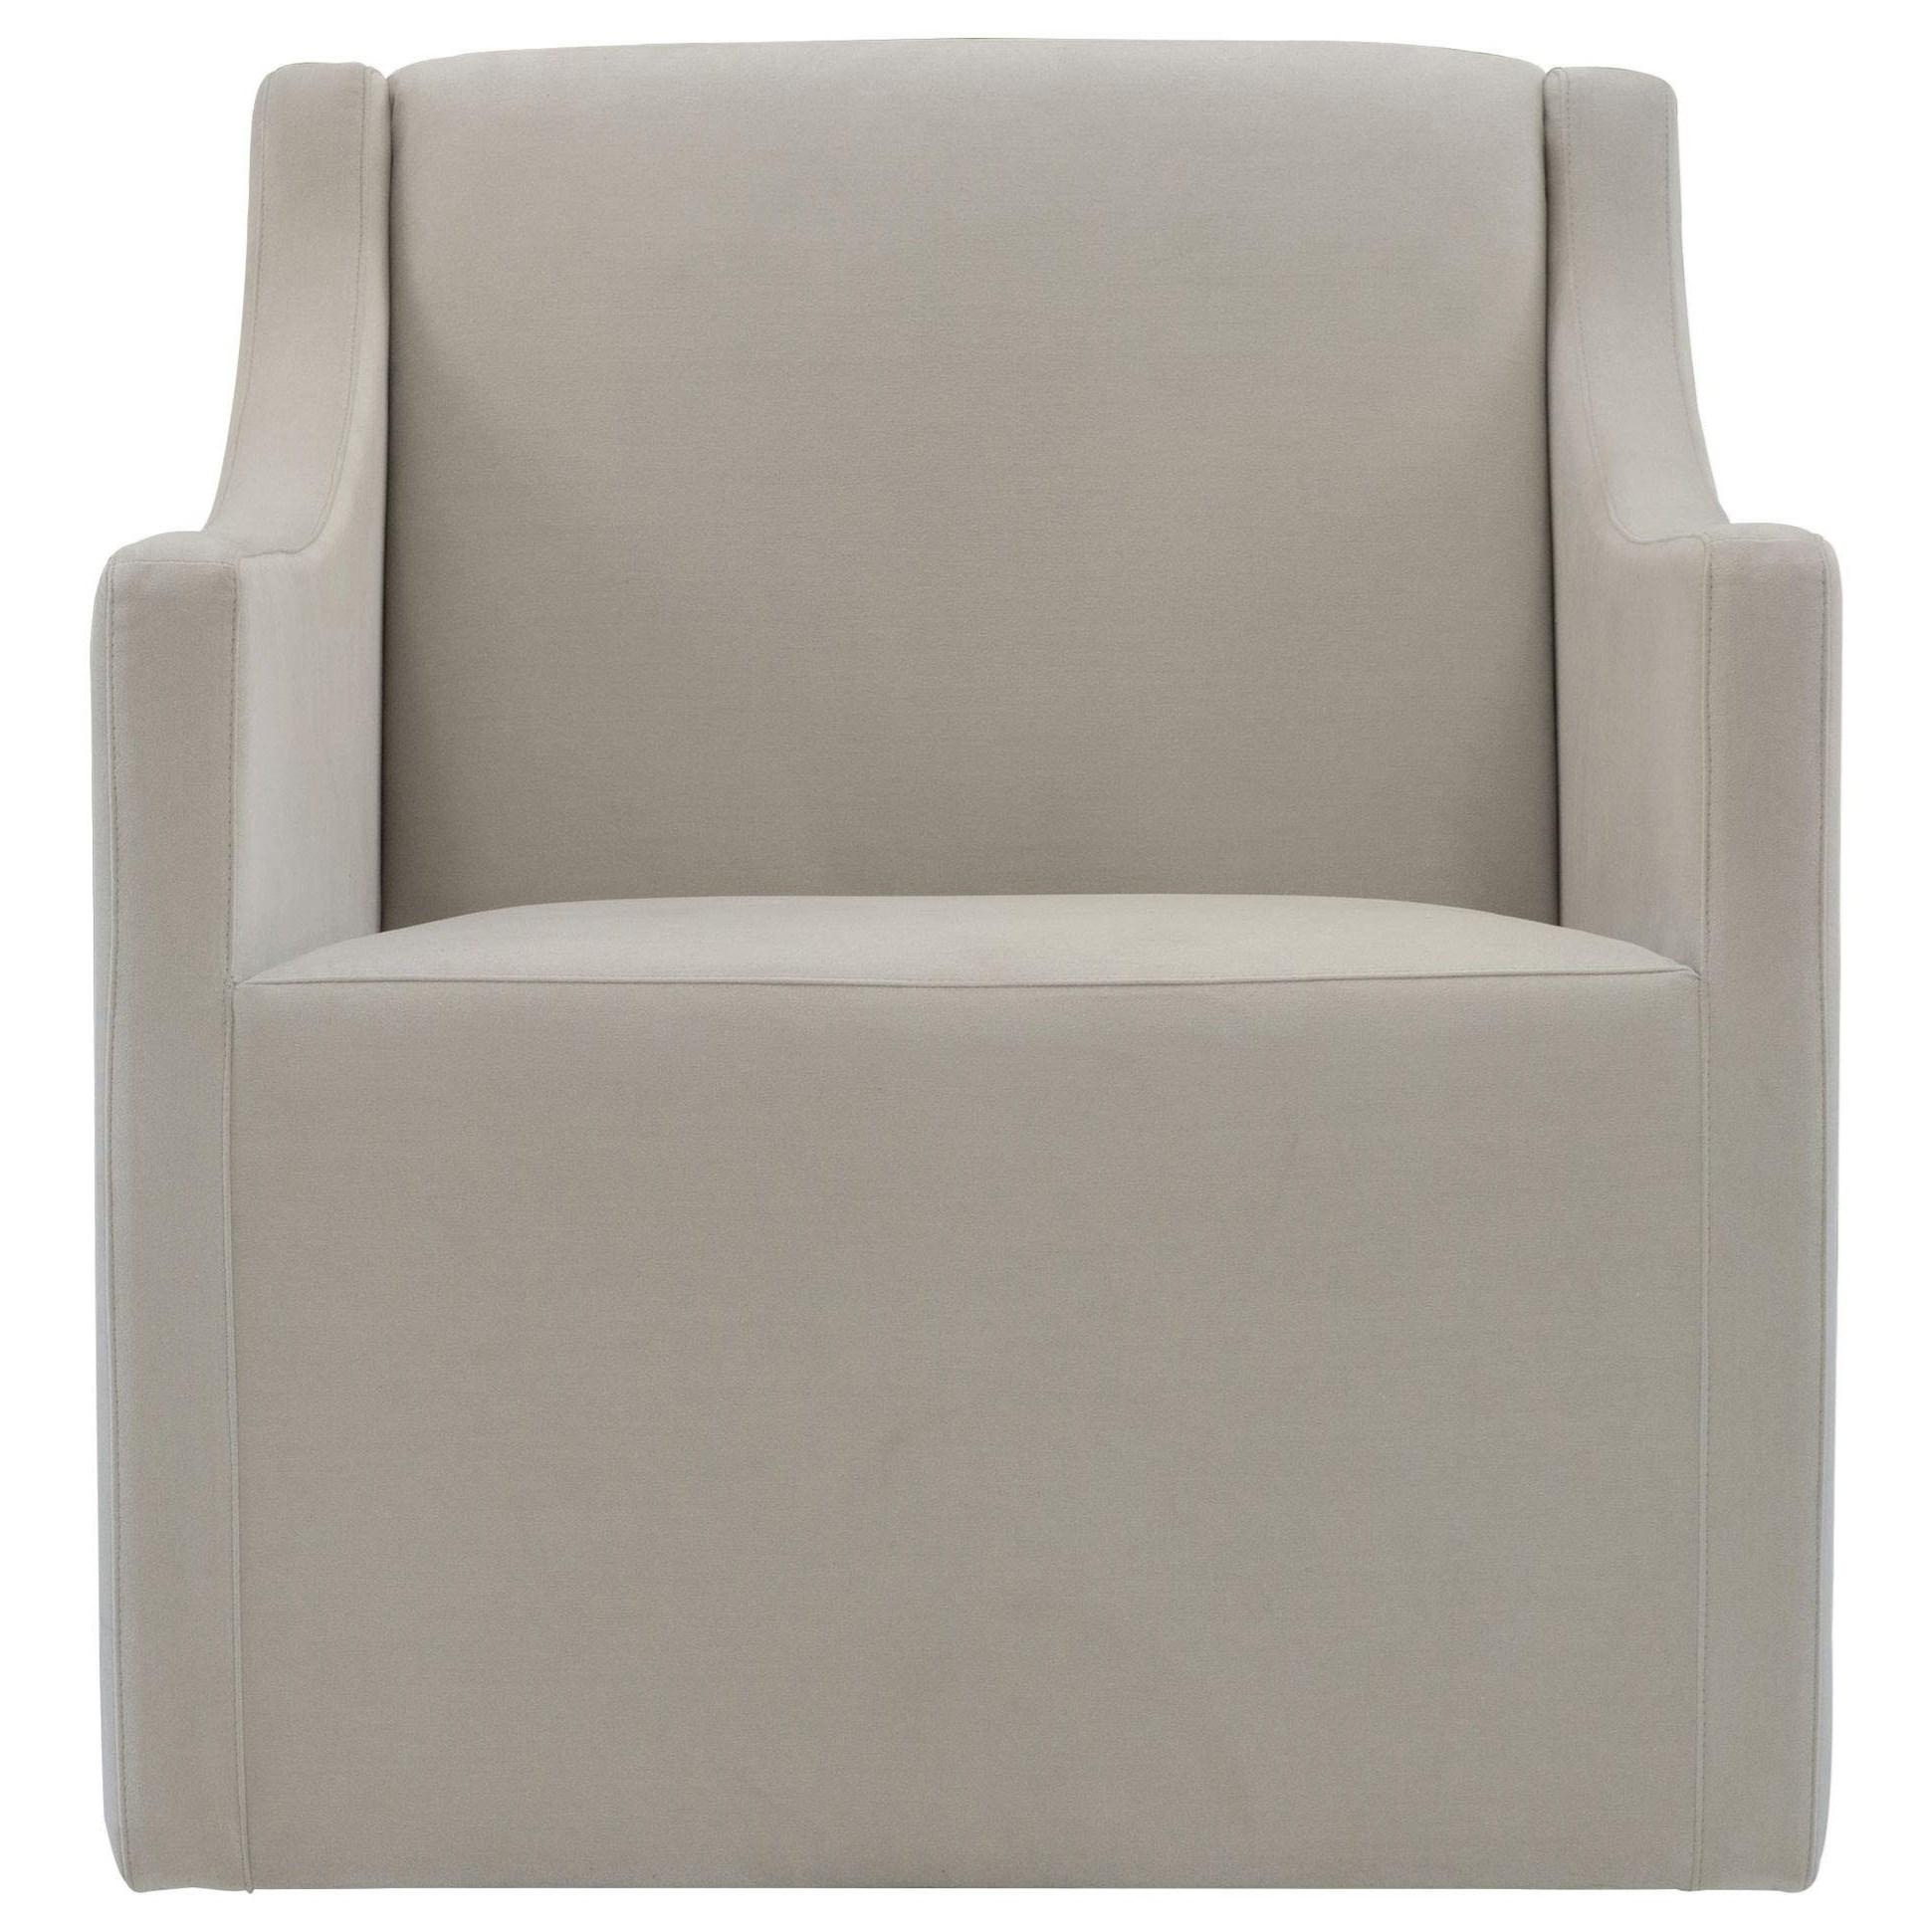 Loft - Highland Park Elle Swivel Chair by Bernhardt at Baer's Furniture